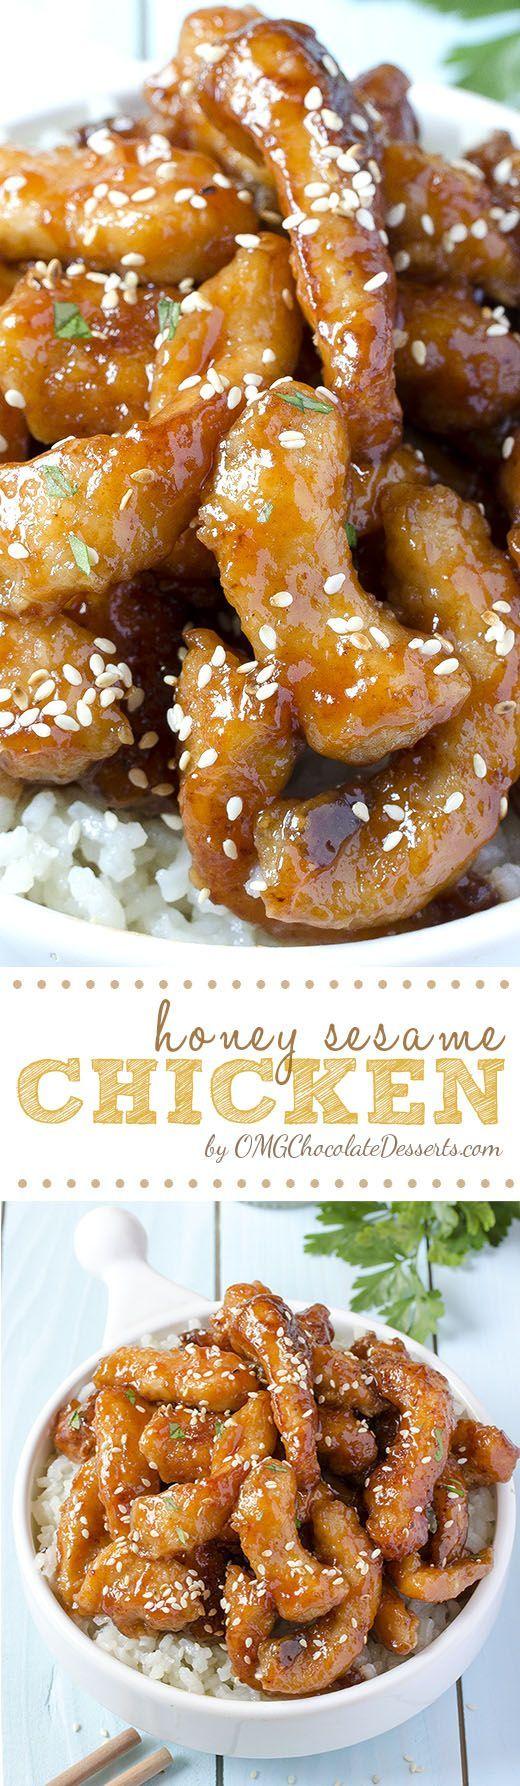 Honey Sesame Chicken  Easy Baked Chicken Recipe Fried Chicken Pieces In A  Sticky Sweet